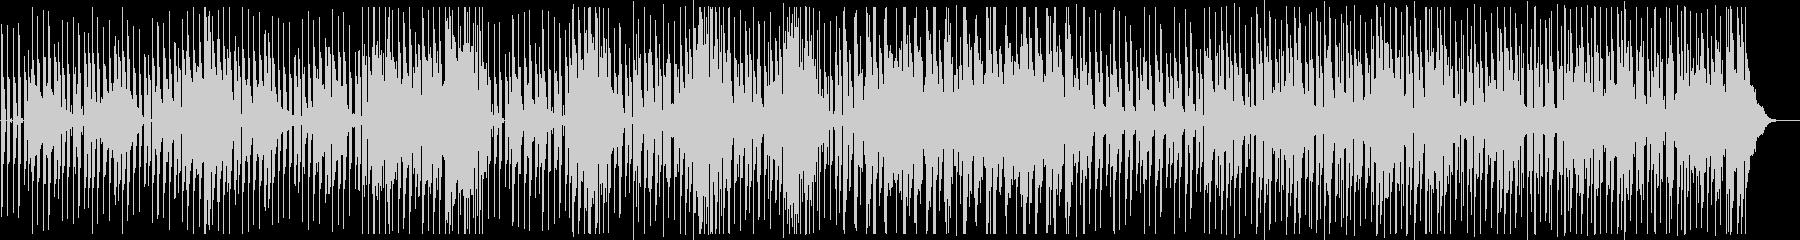 ALTERNATE MIX-高い弦...の未再生の波形